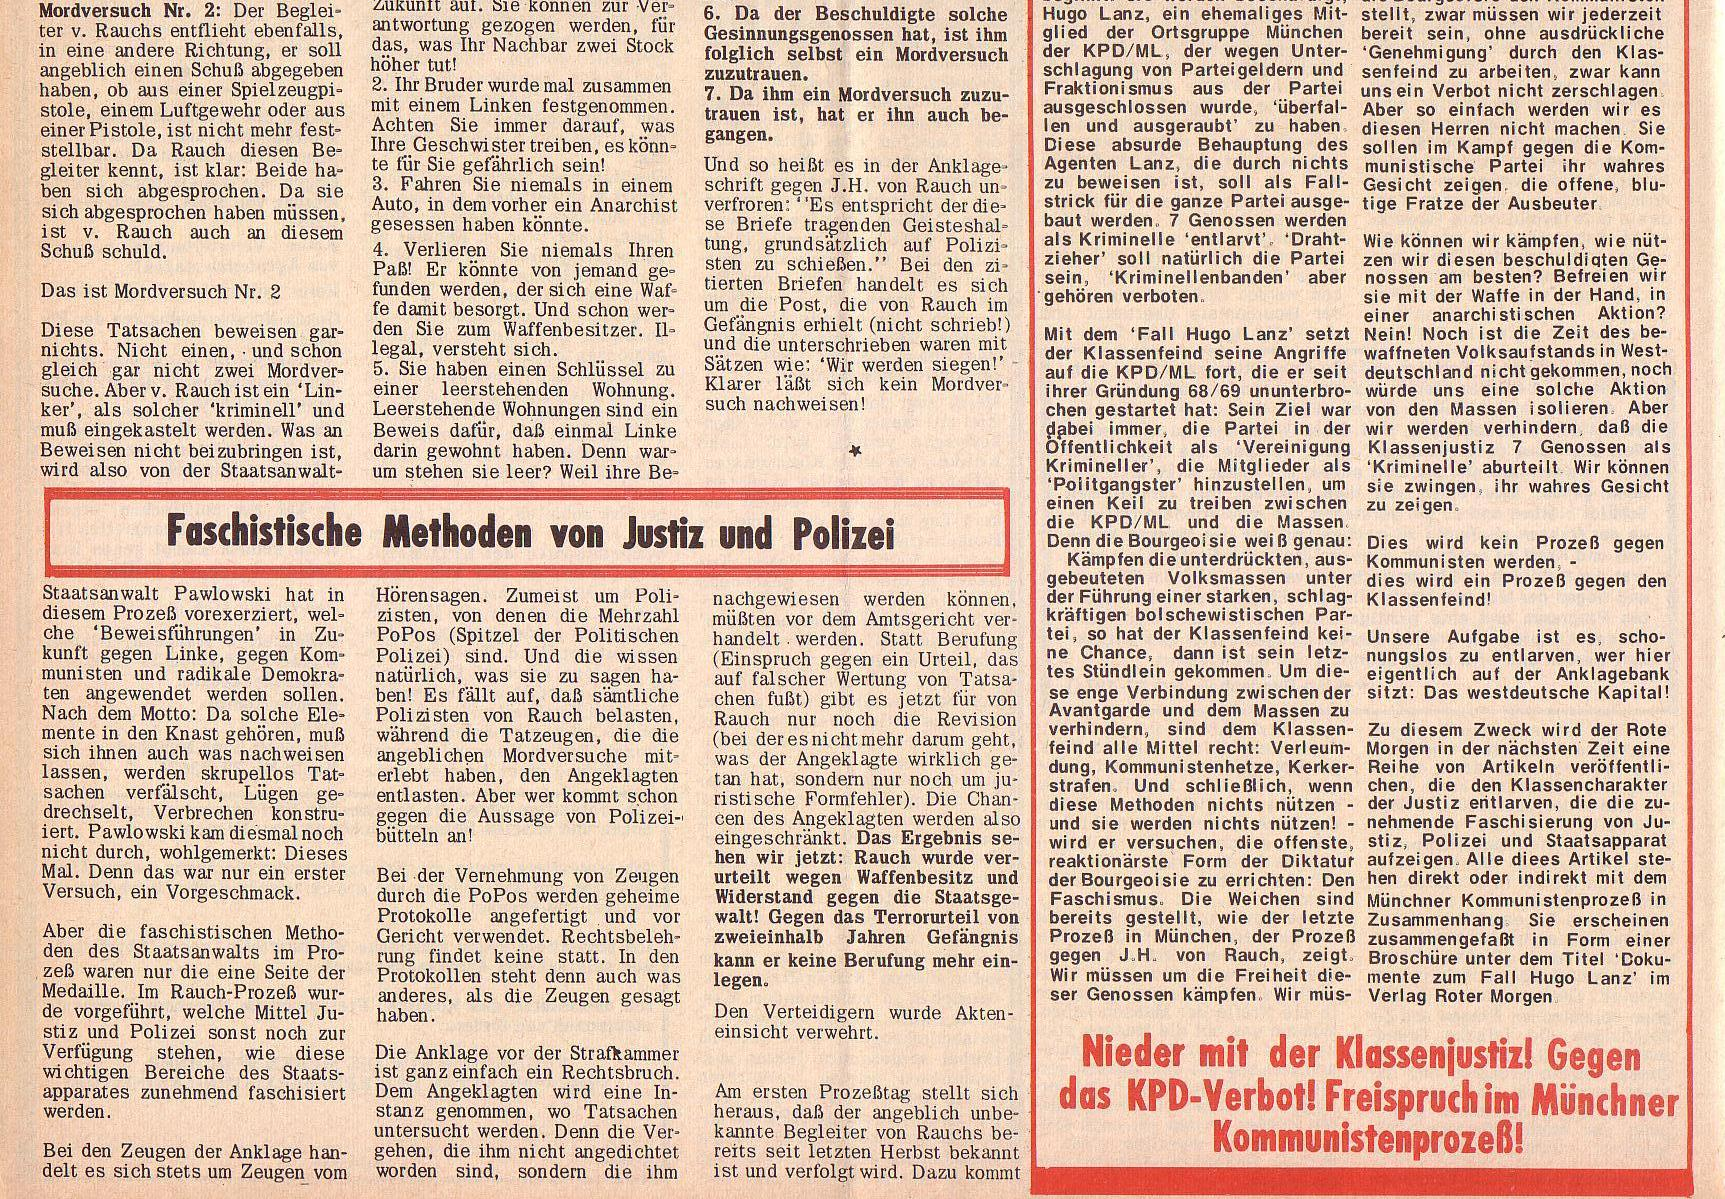 Roter Morgen, 6. Jg., 28. Februar 1972, Nr. 5, Seite 8b